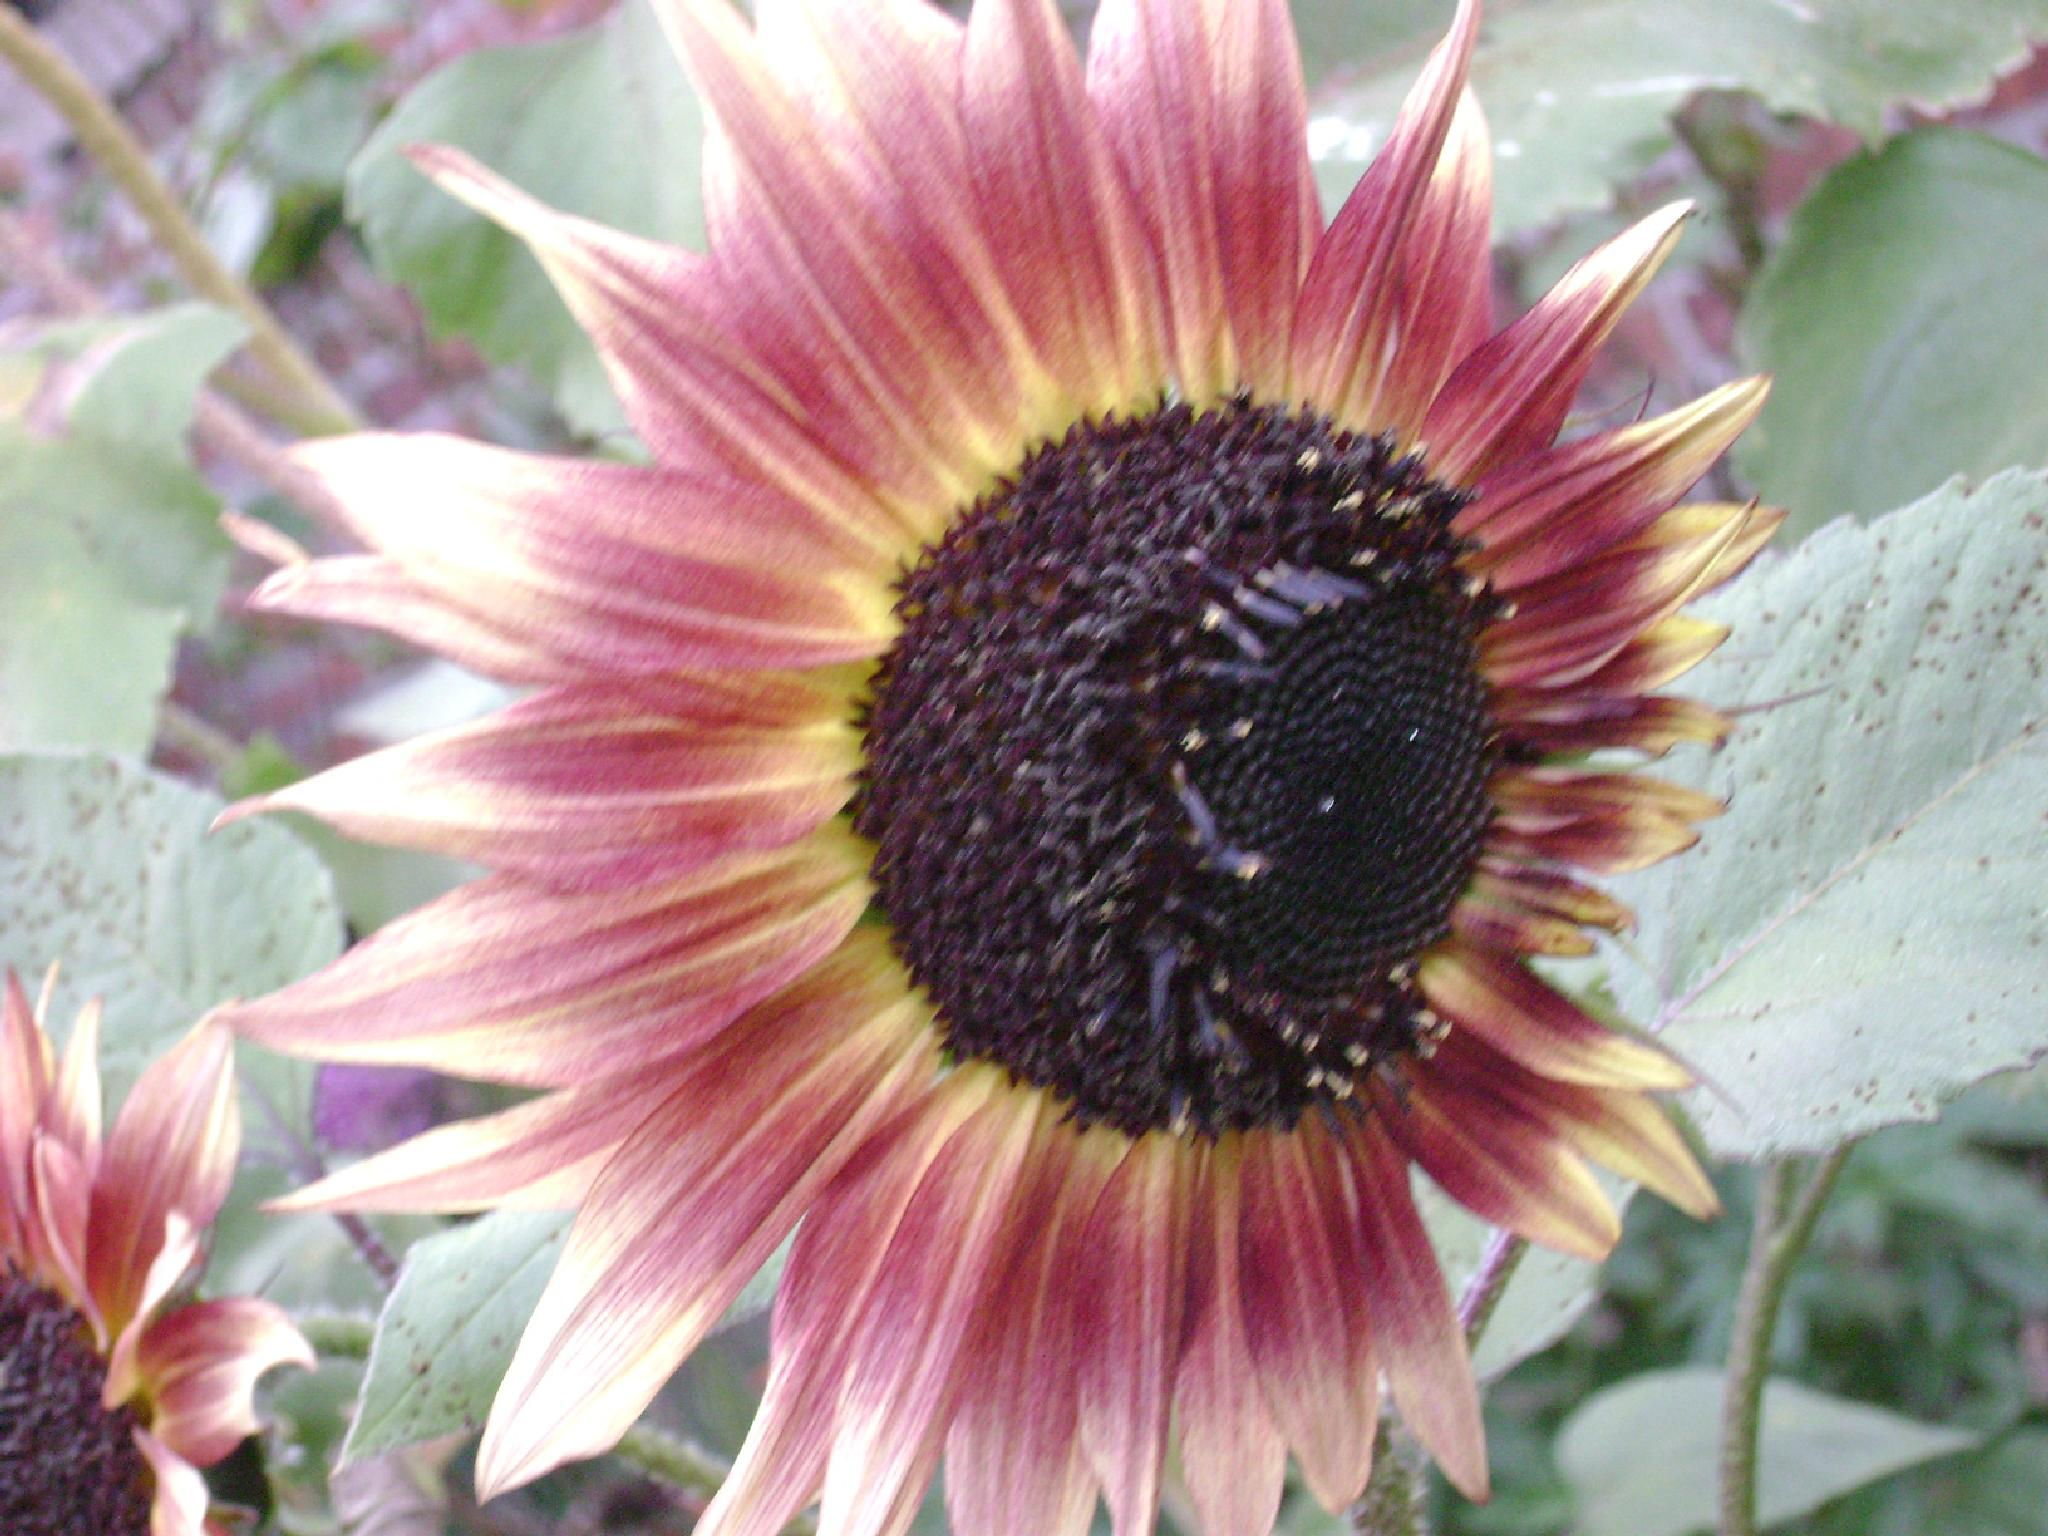 Sunflower by Diana Marenfeld